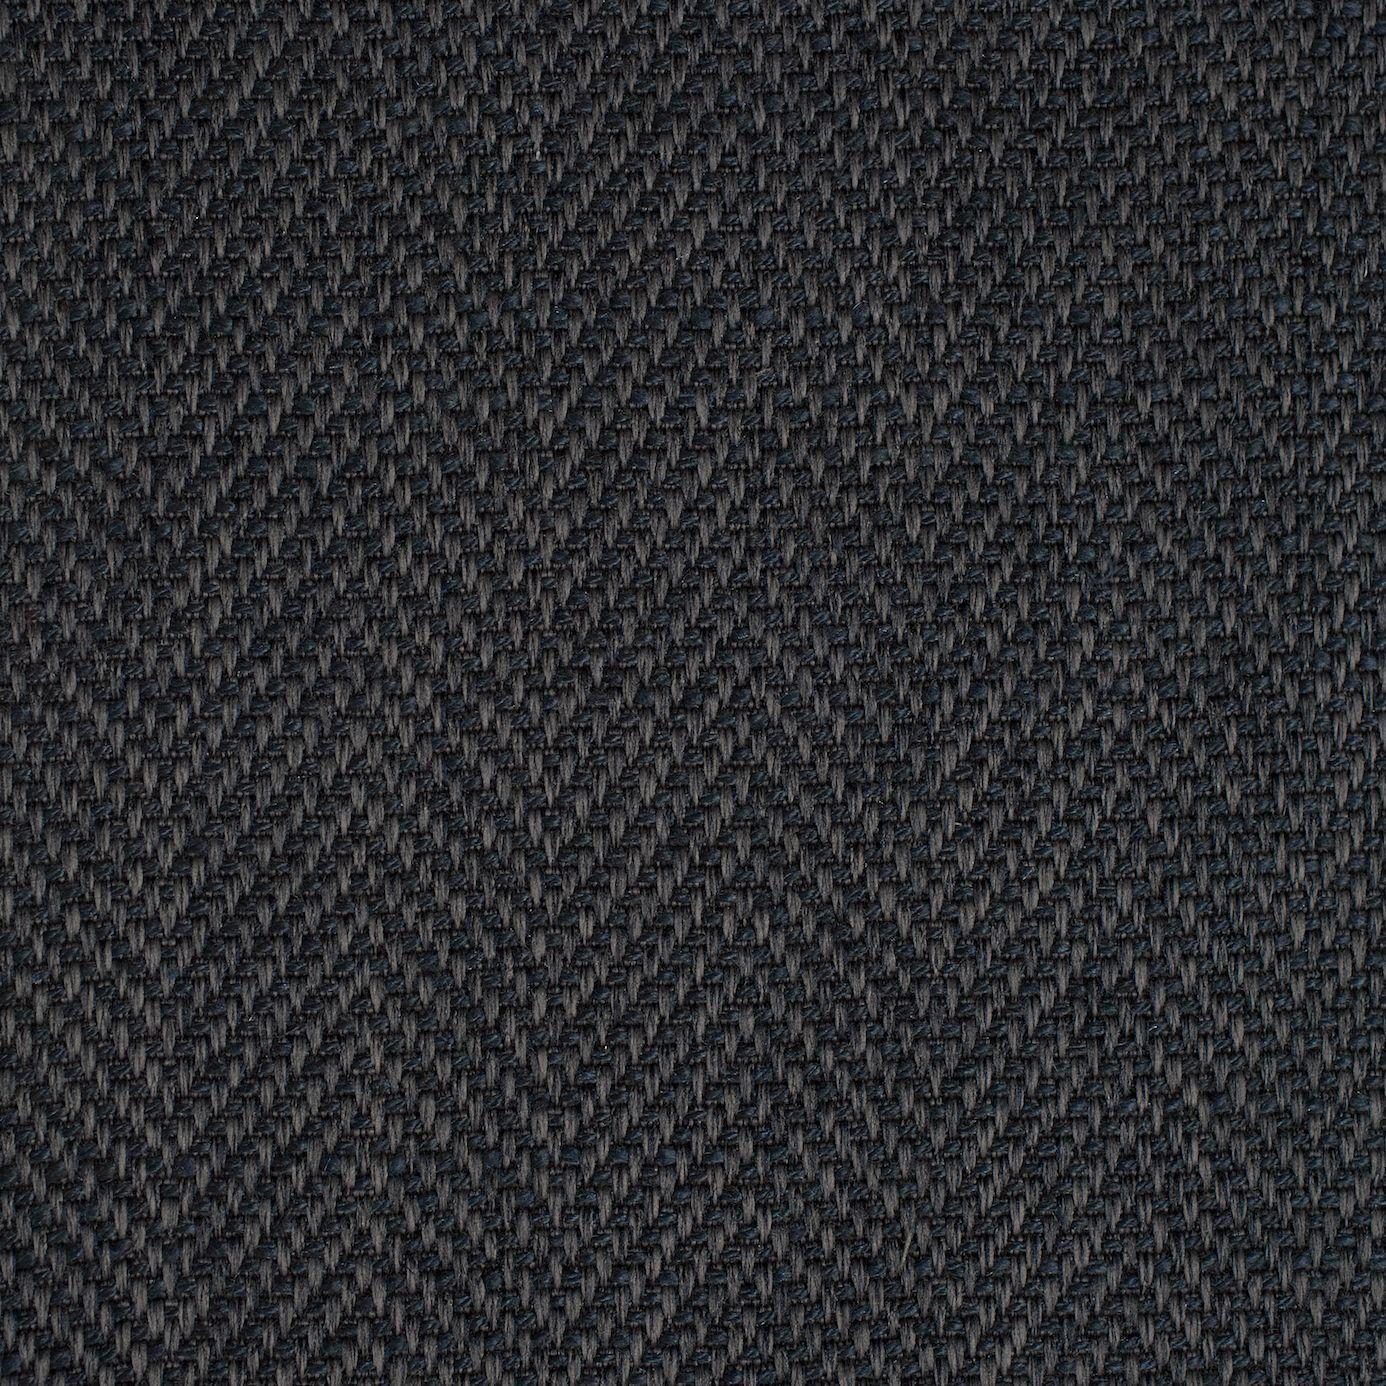 Roman blinds in sadiki fabric dark grey 1606 for Fabrics and materials